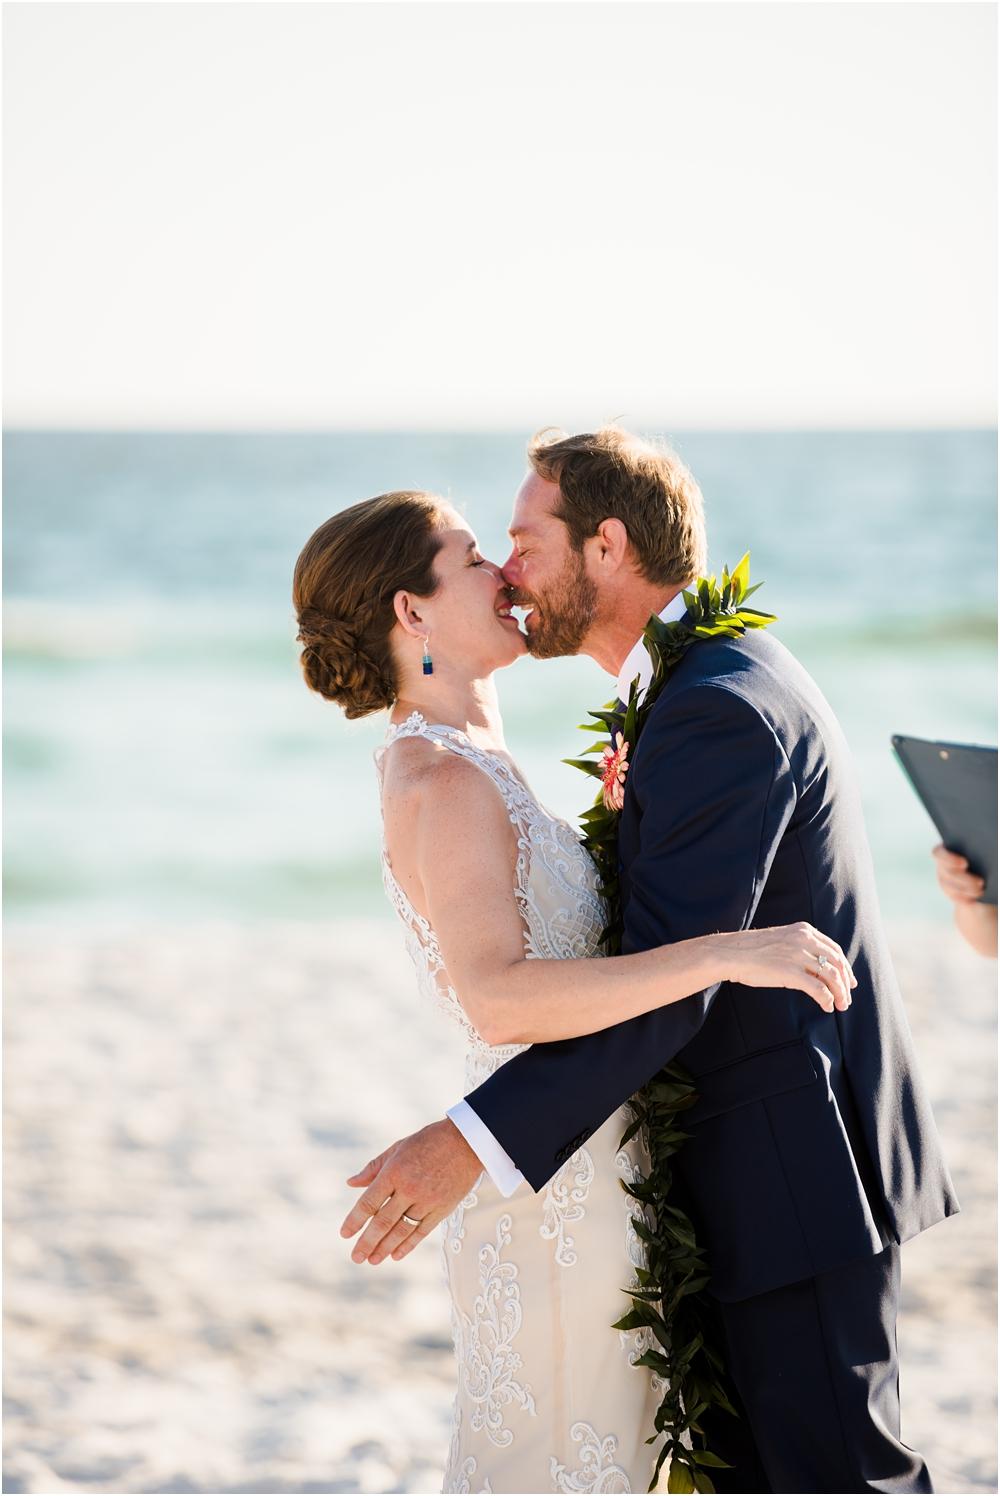 ledman-wedding-kiersten-stevenson-photography-30a-panama-city-beach-dothan-tallahassee-(239-of-763).JPG